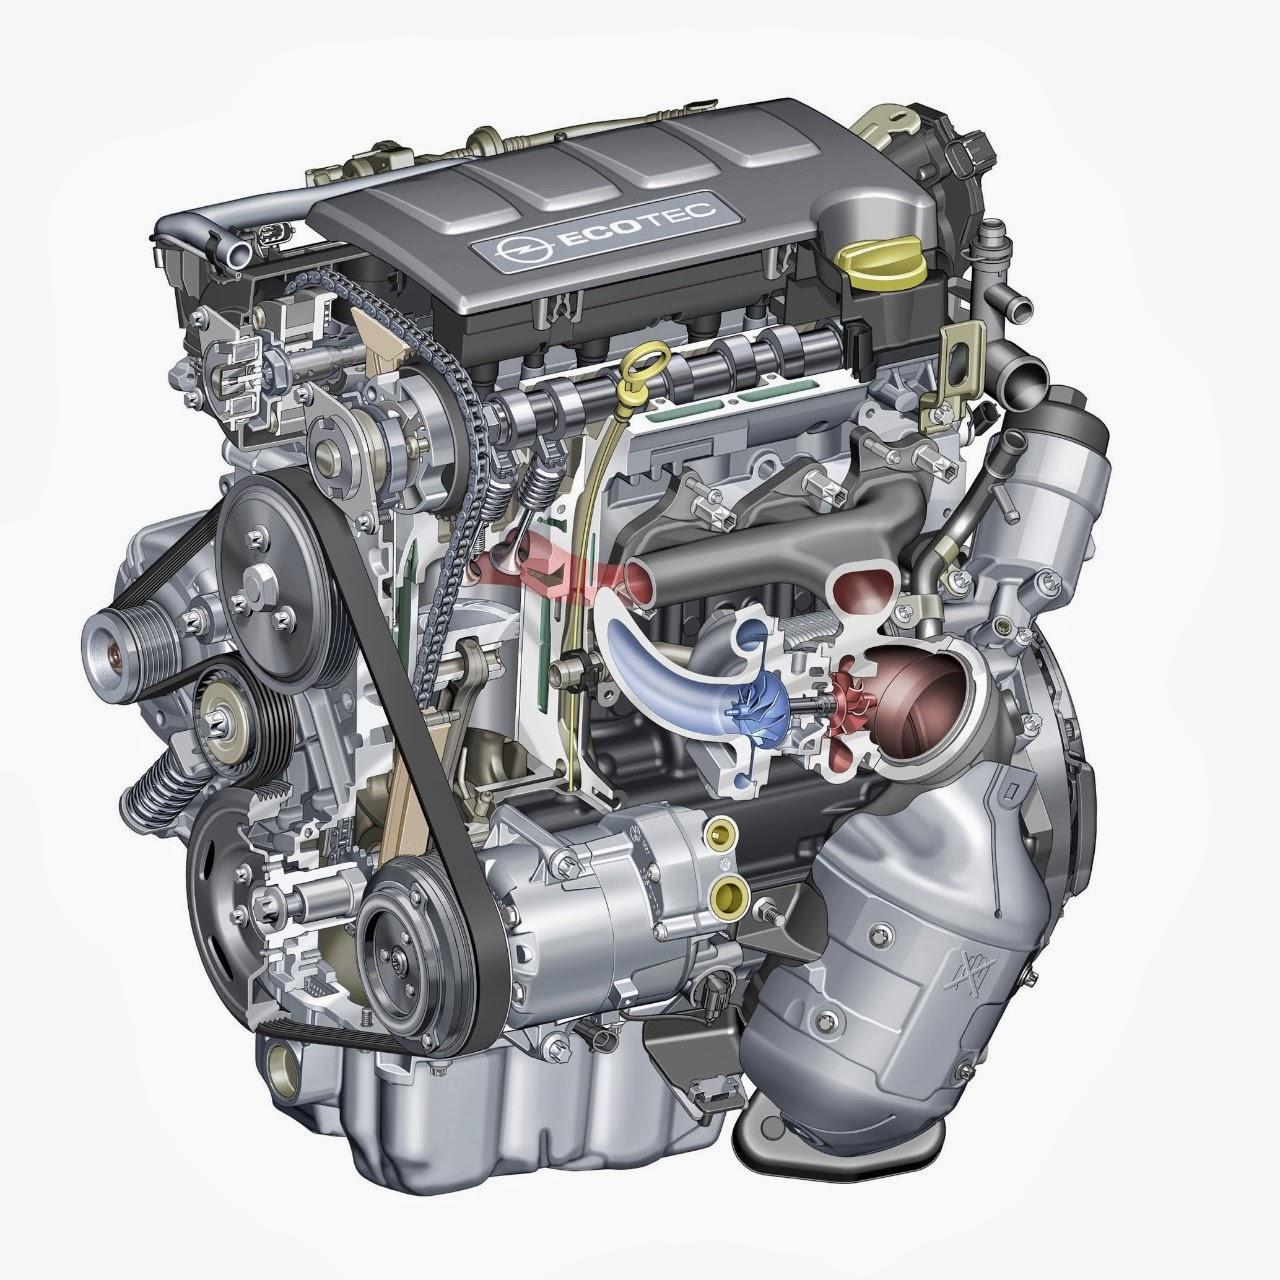 2004 Chrysler Sebring Vacuum Line Diagram, 2004, Free Engine Image For User Manual Download